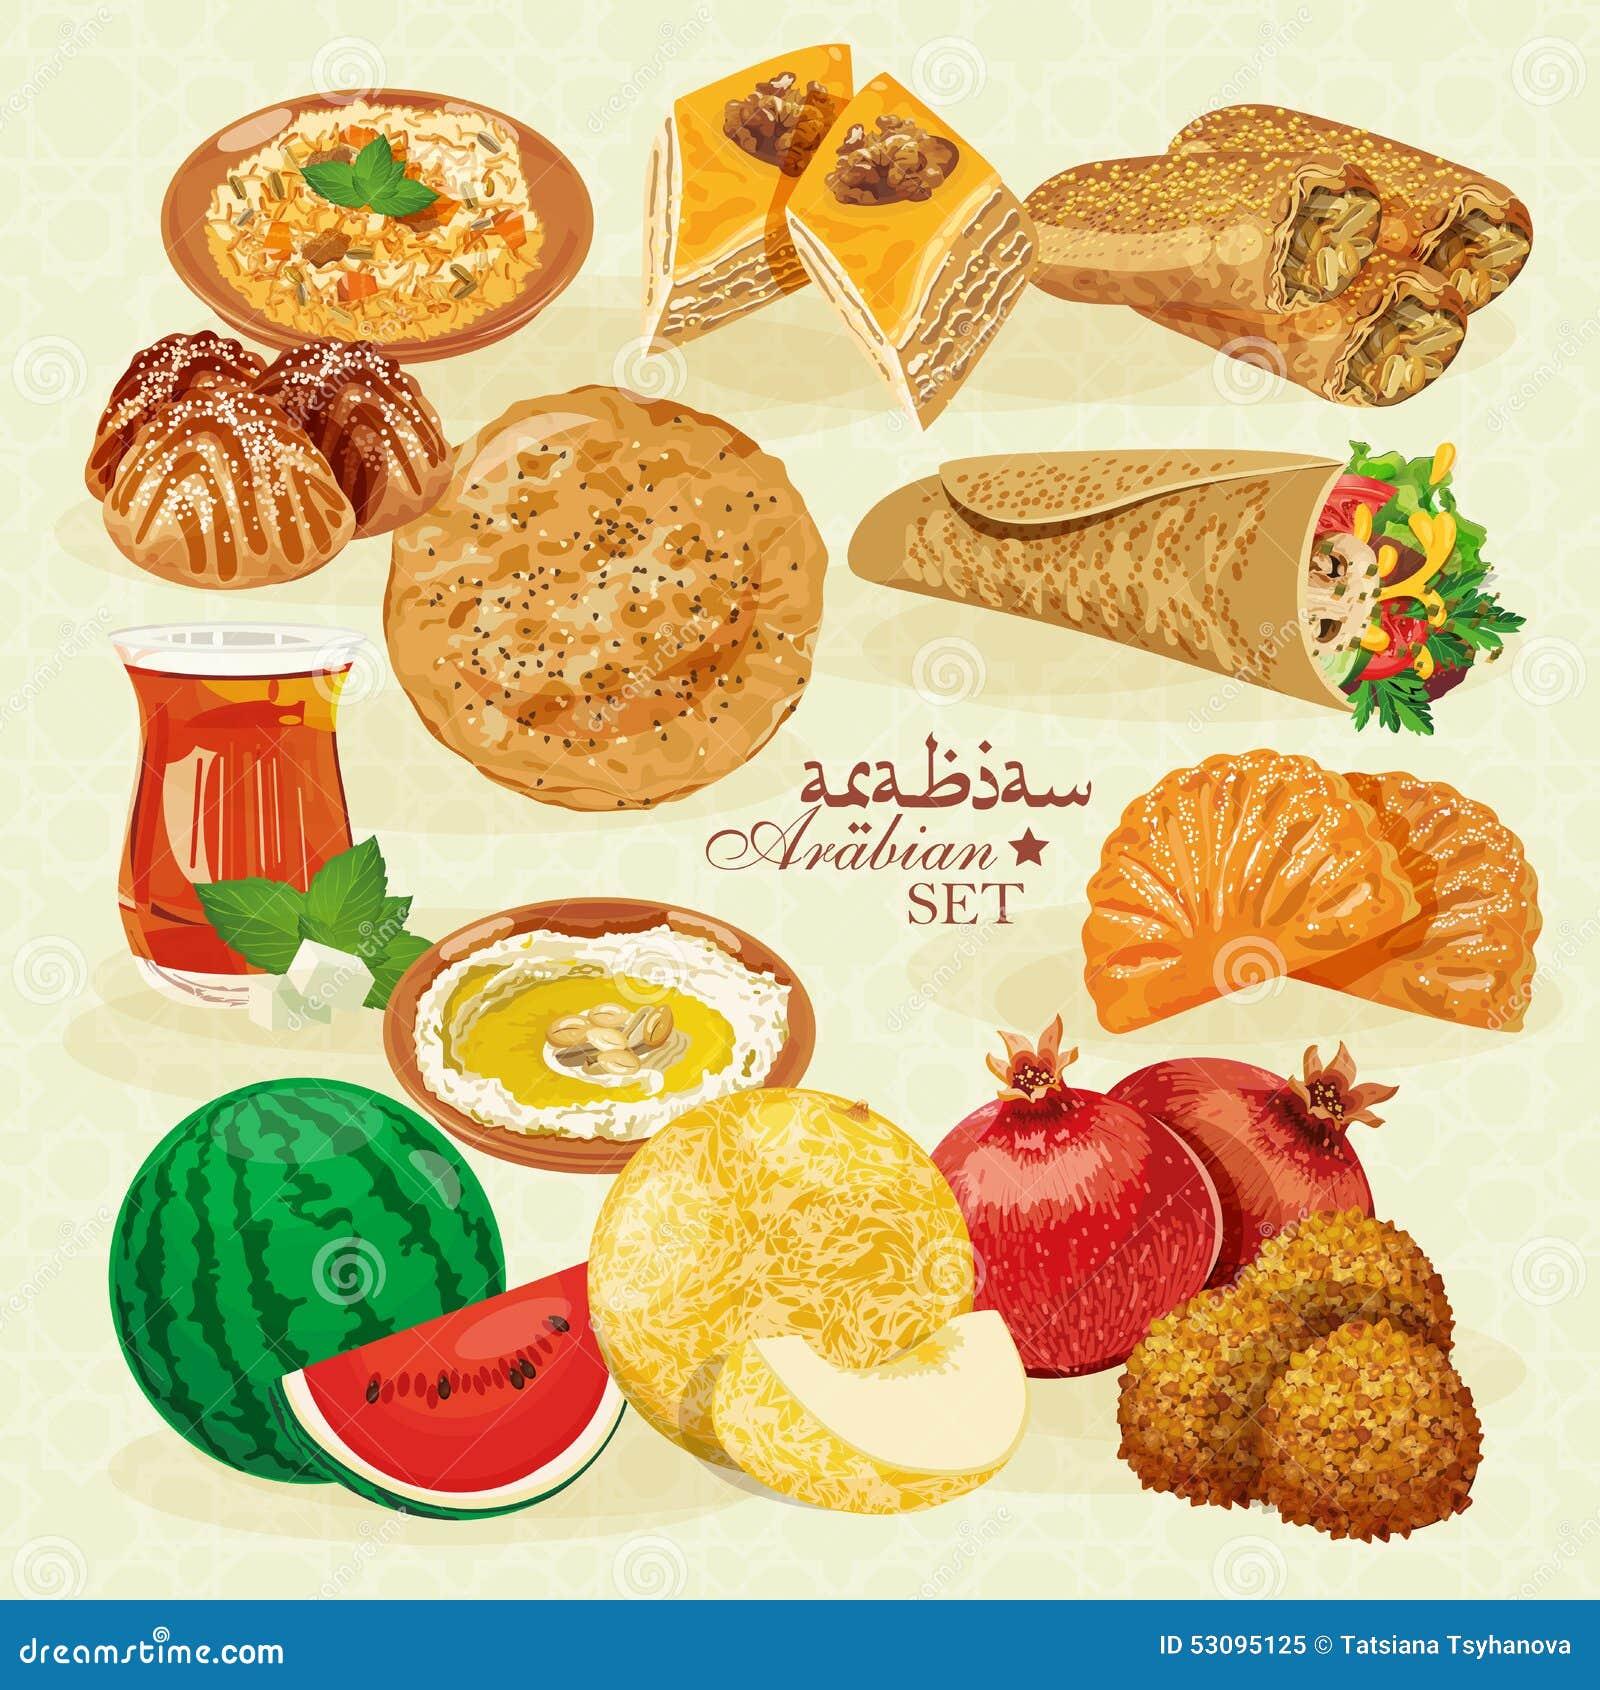 Set Of Traditional Arabian Halal Food Stock Vector - Image: 53095125